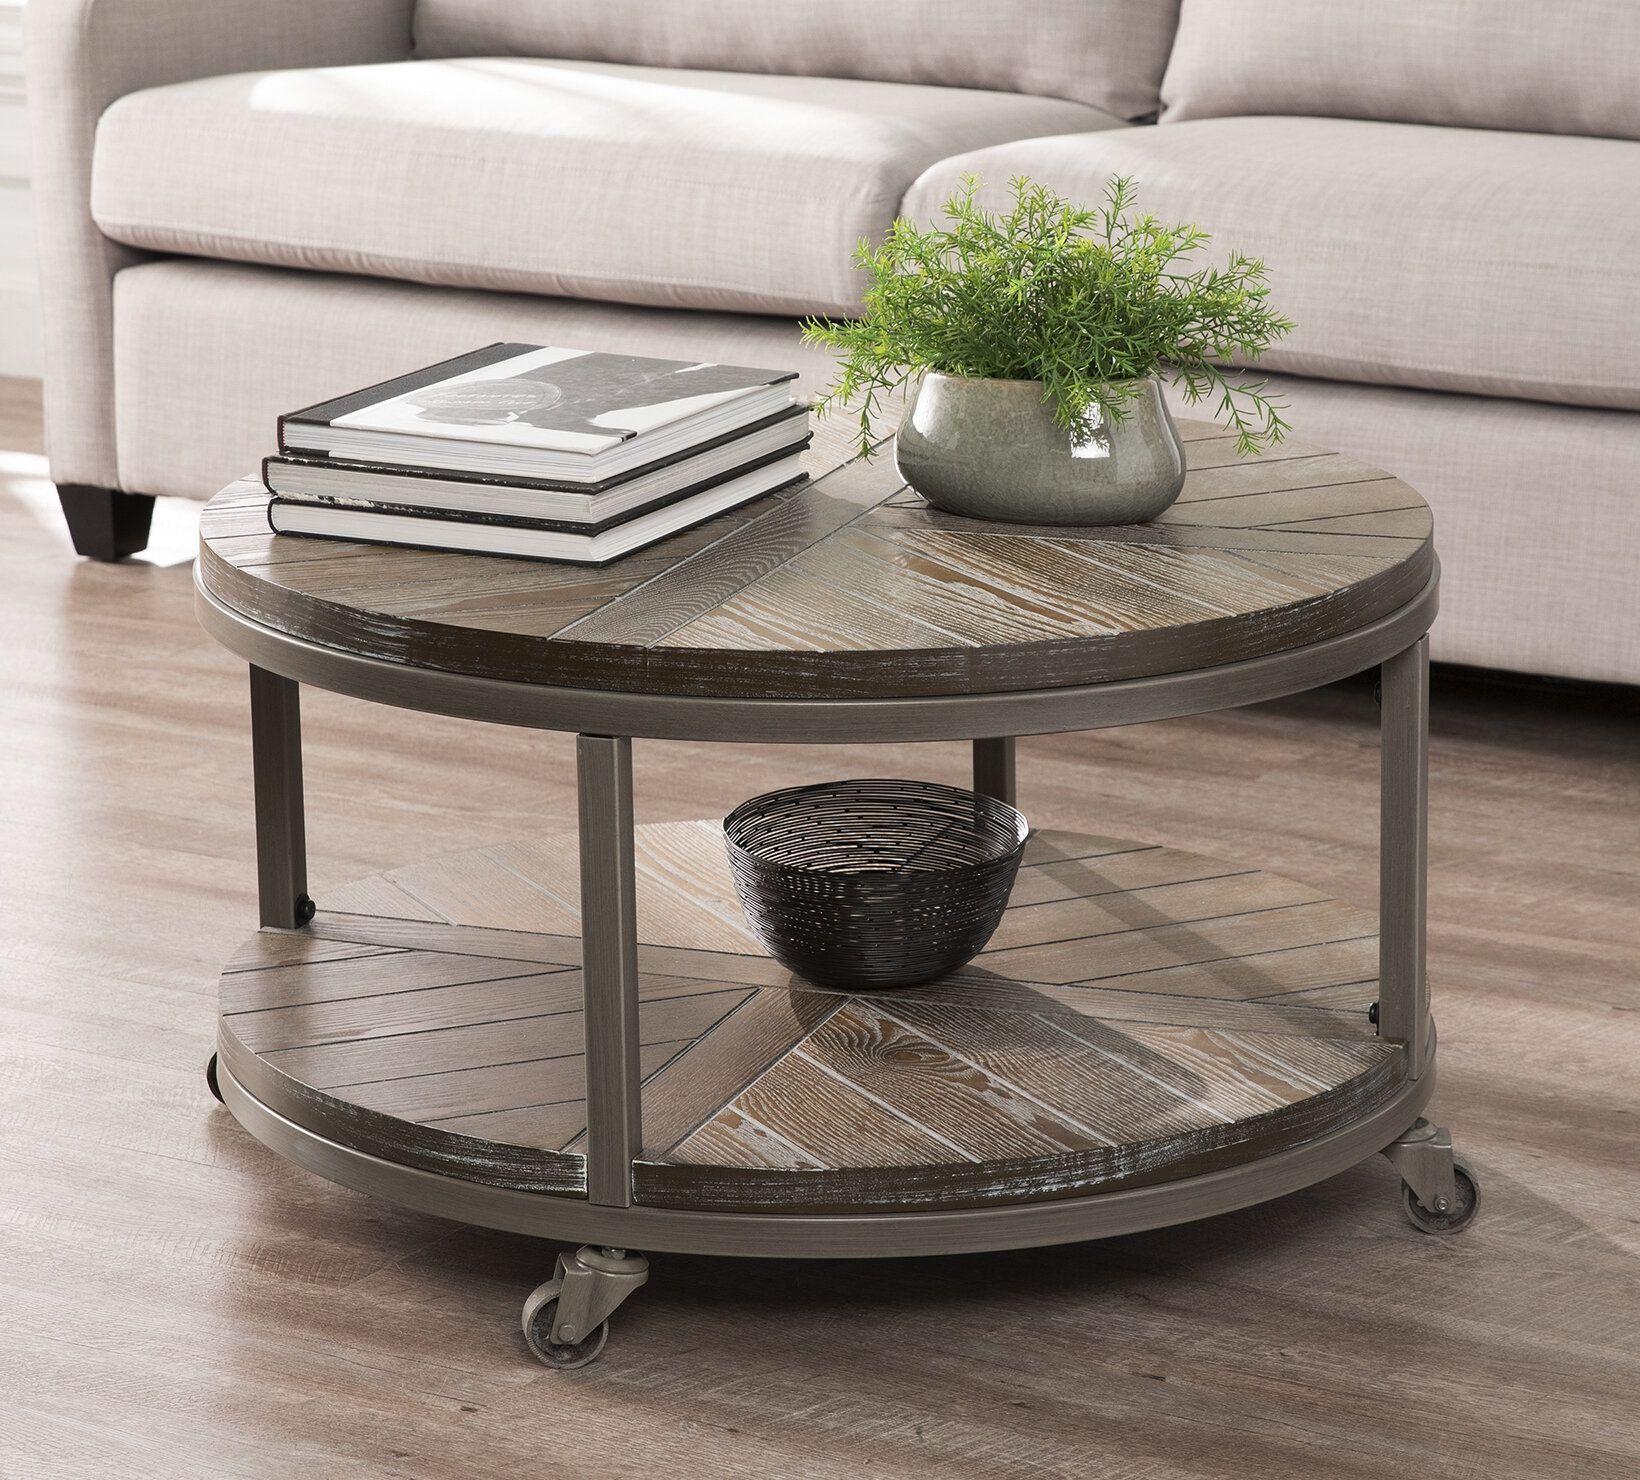 Brien Wheel Coffee Table With Storage Round Coffee Table Living Room Coffee Table Coffee Table Wood [ 1480 x 1640 Pixel ]